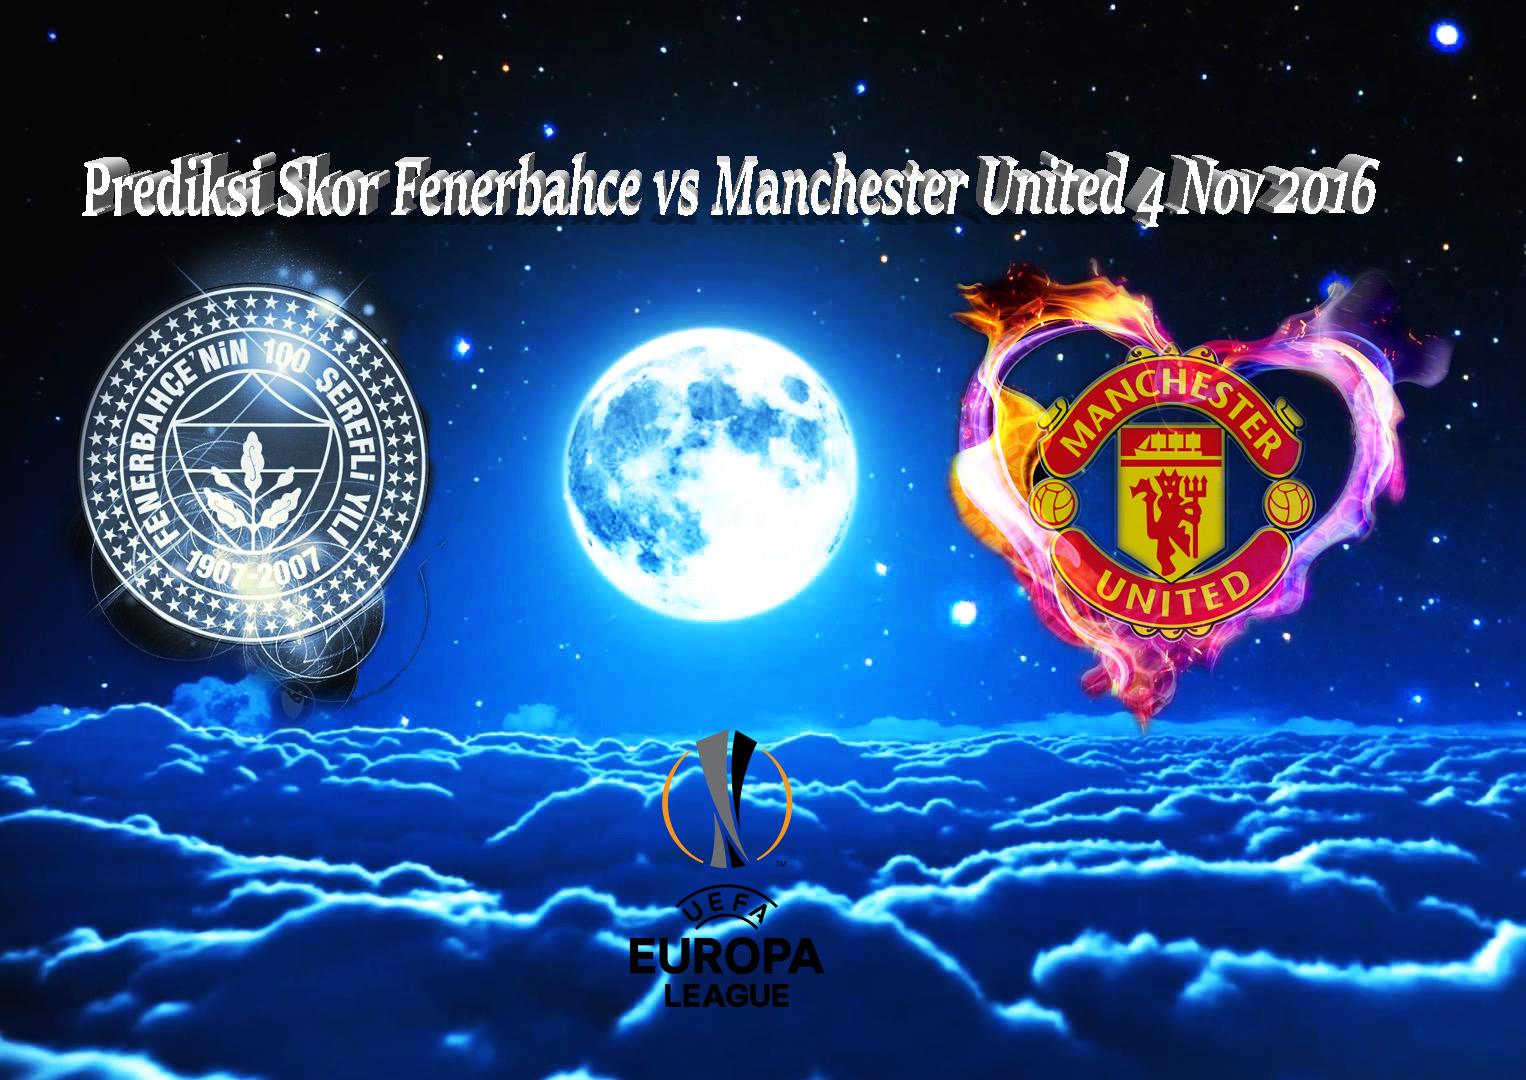 Prediksi Skor Fenerbahce vs Manchester United